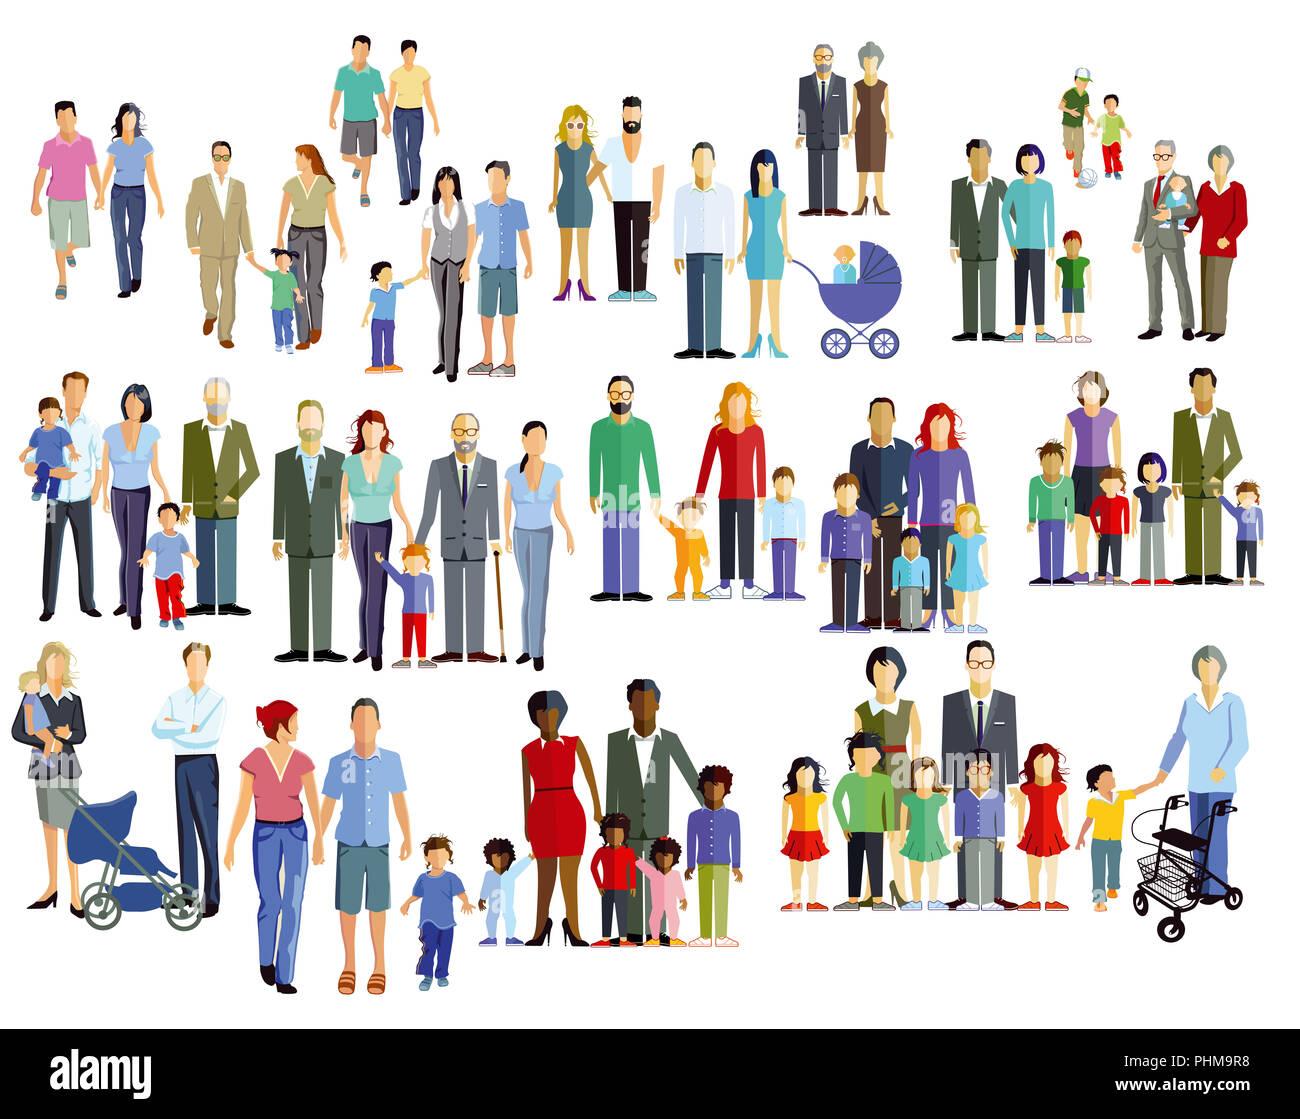 Family members, generation groups, illustration - Stock Image